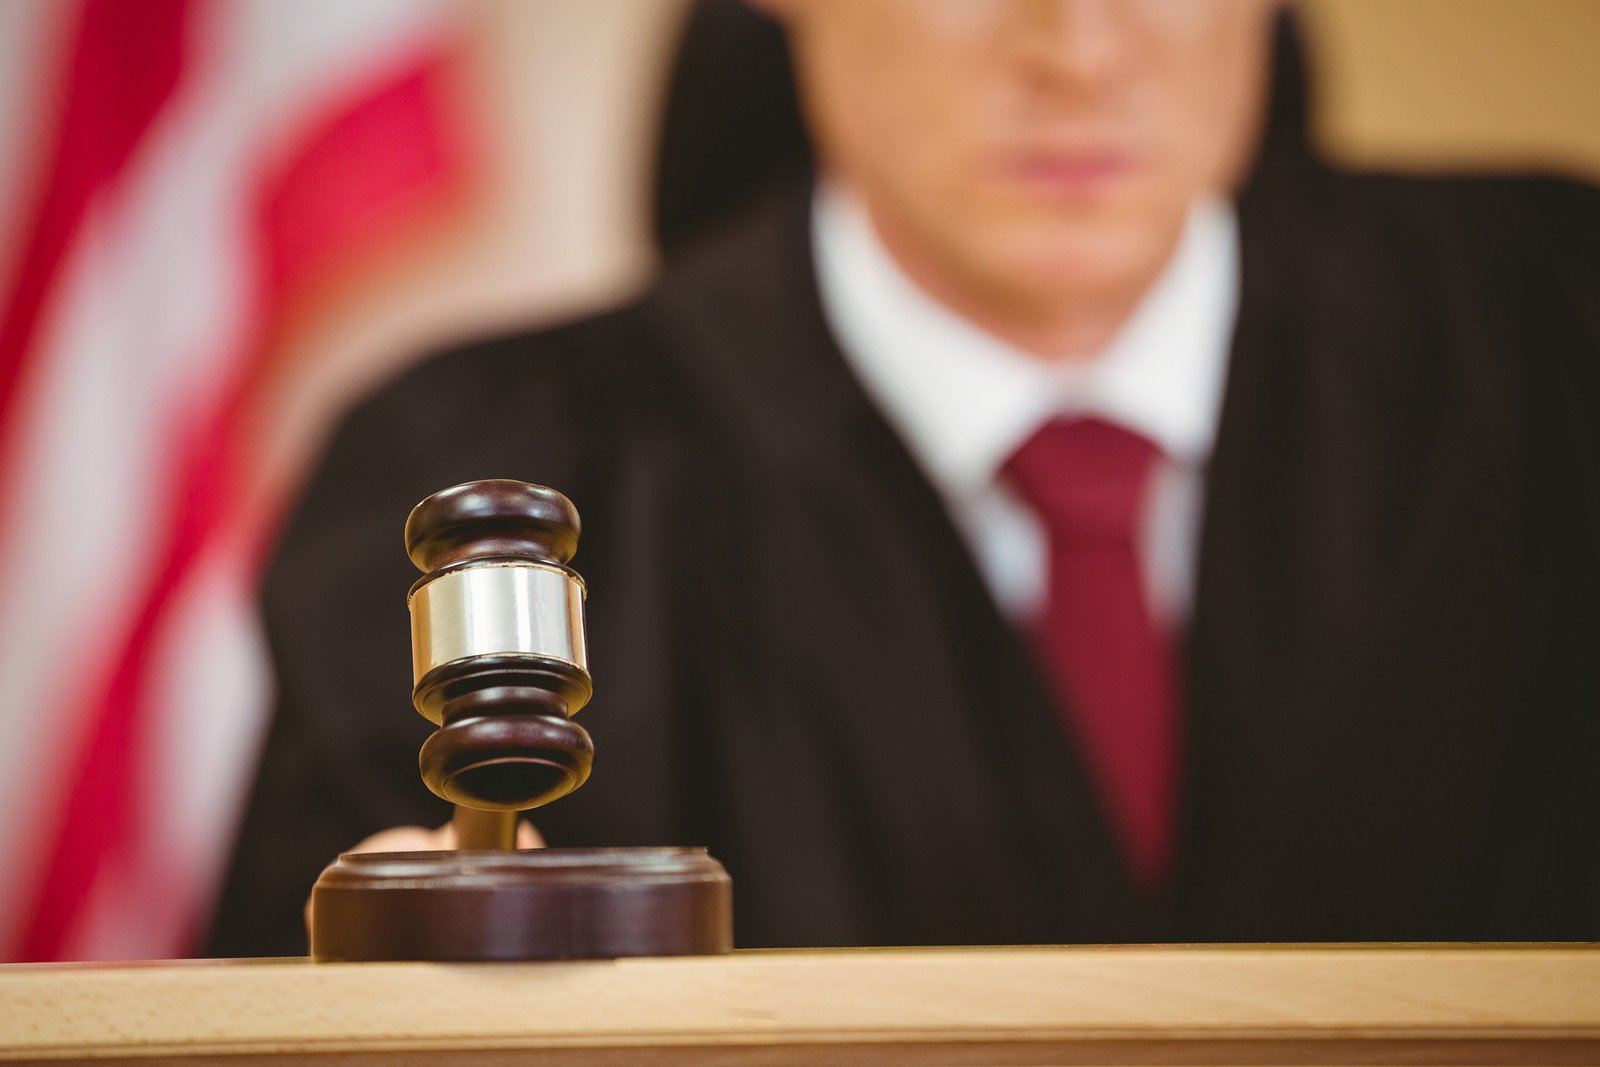 Criminal case - judge